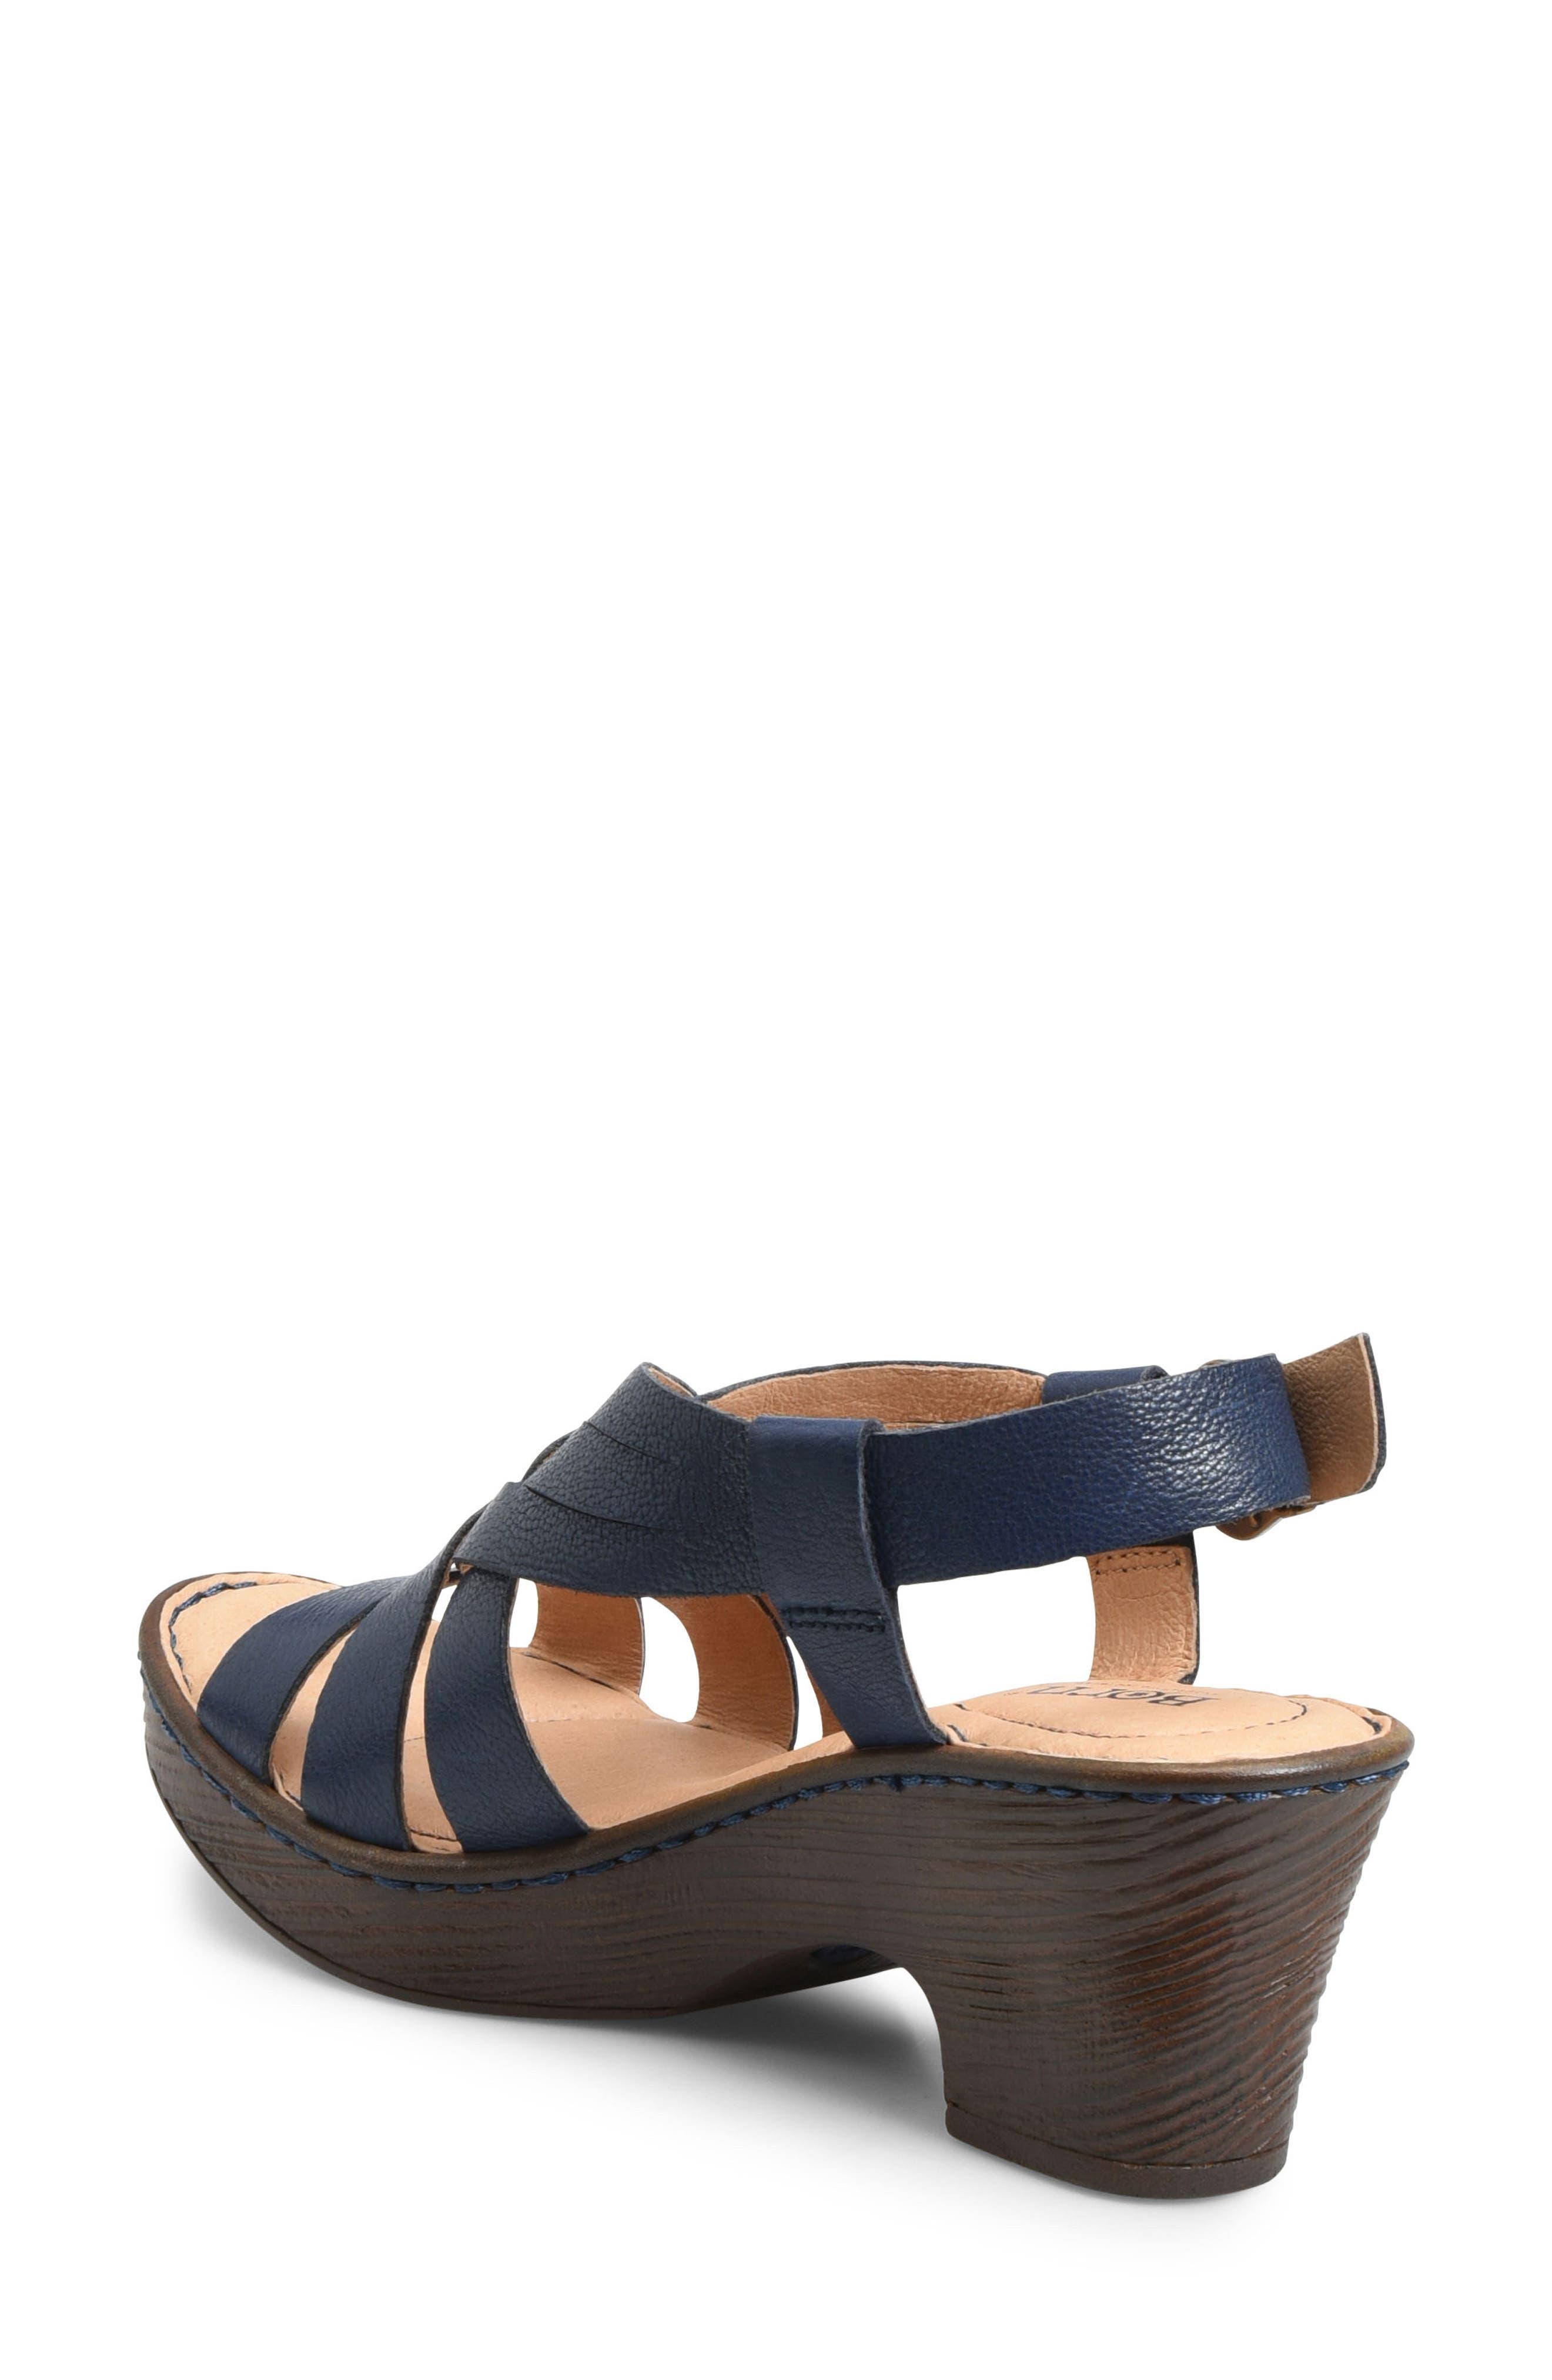 Crevalle Platform Sandal,                             Alternate thumbnail 2, color,                             Navy Leather